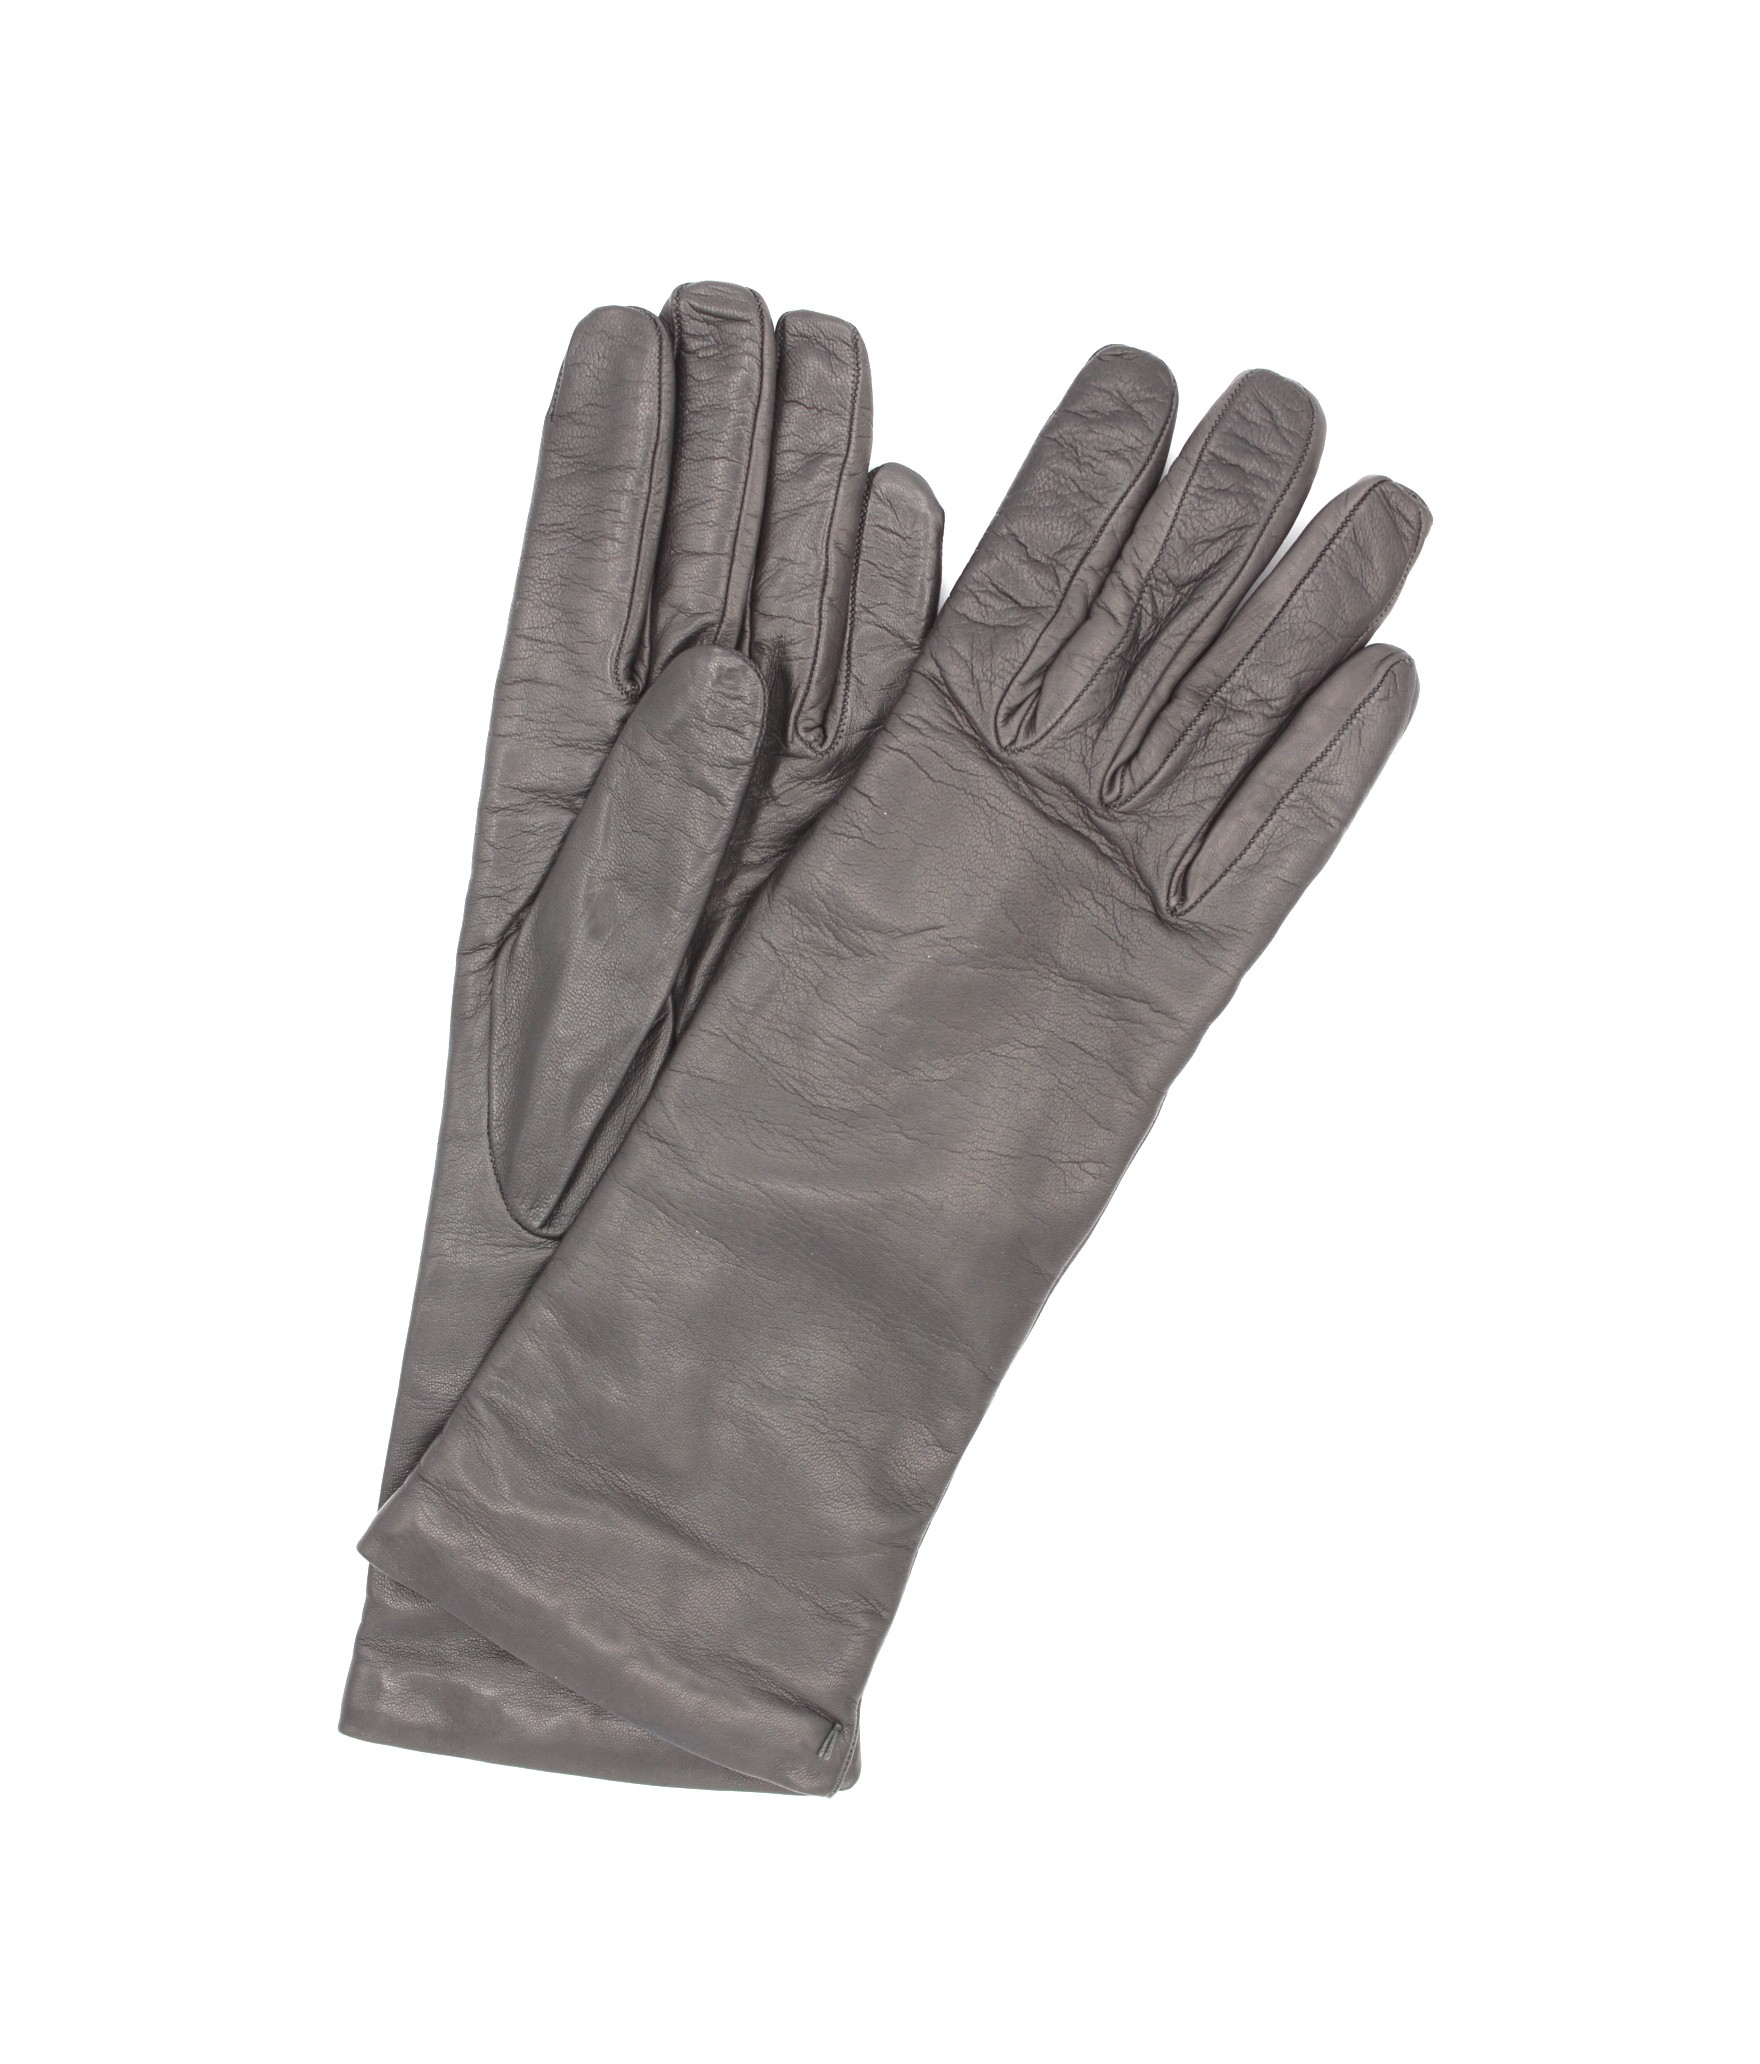 Nappa leather gloves 4bt cashmere lined Grey Sermoneta Gloves